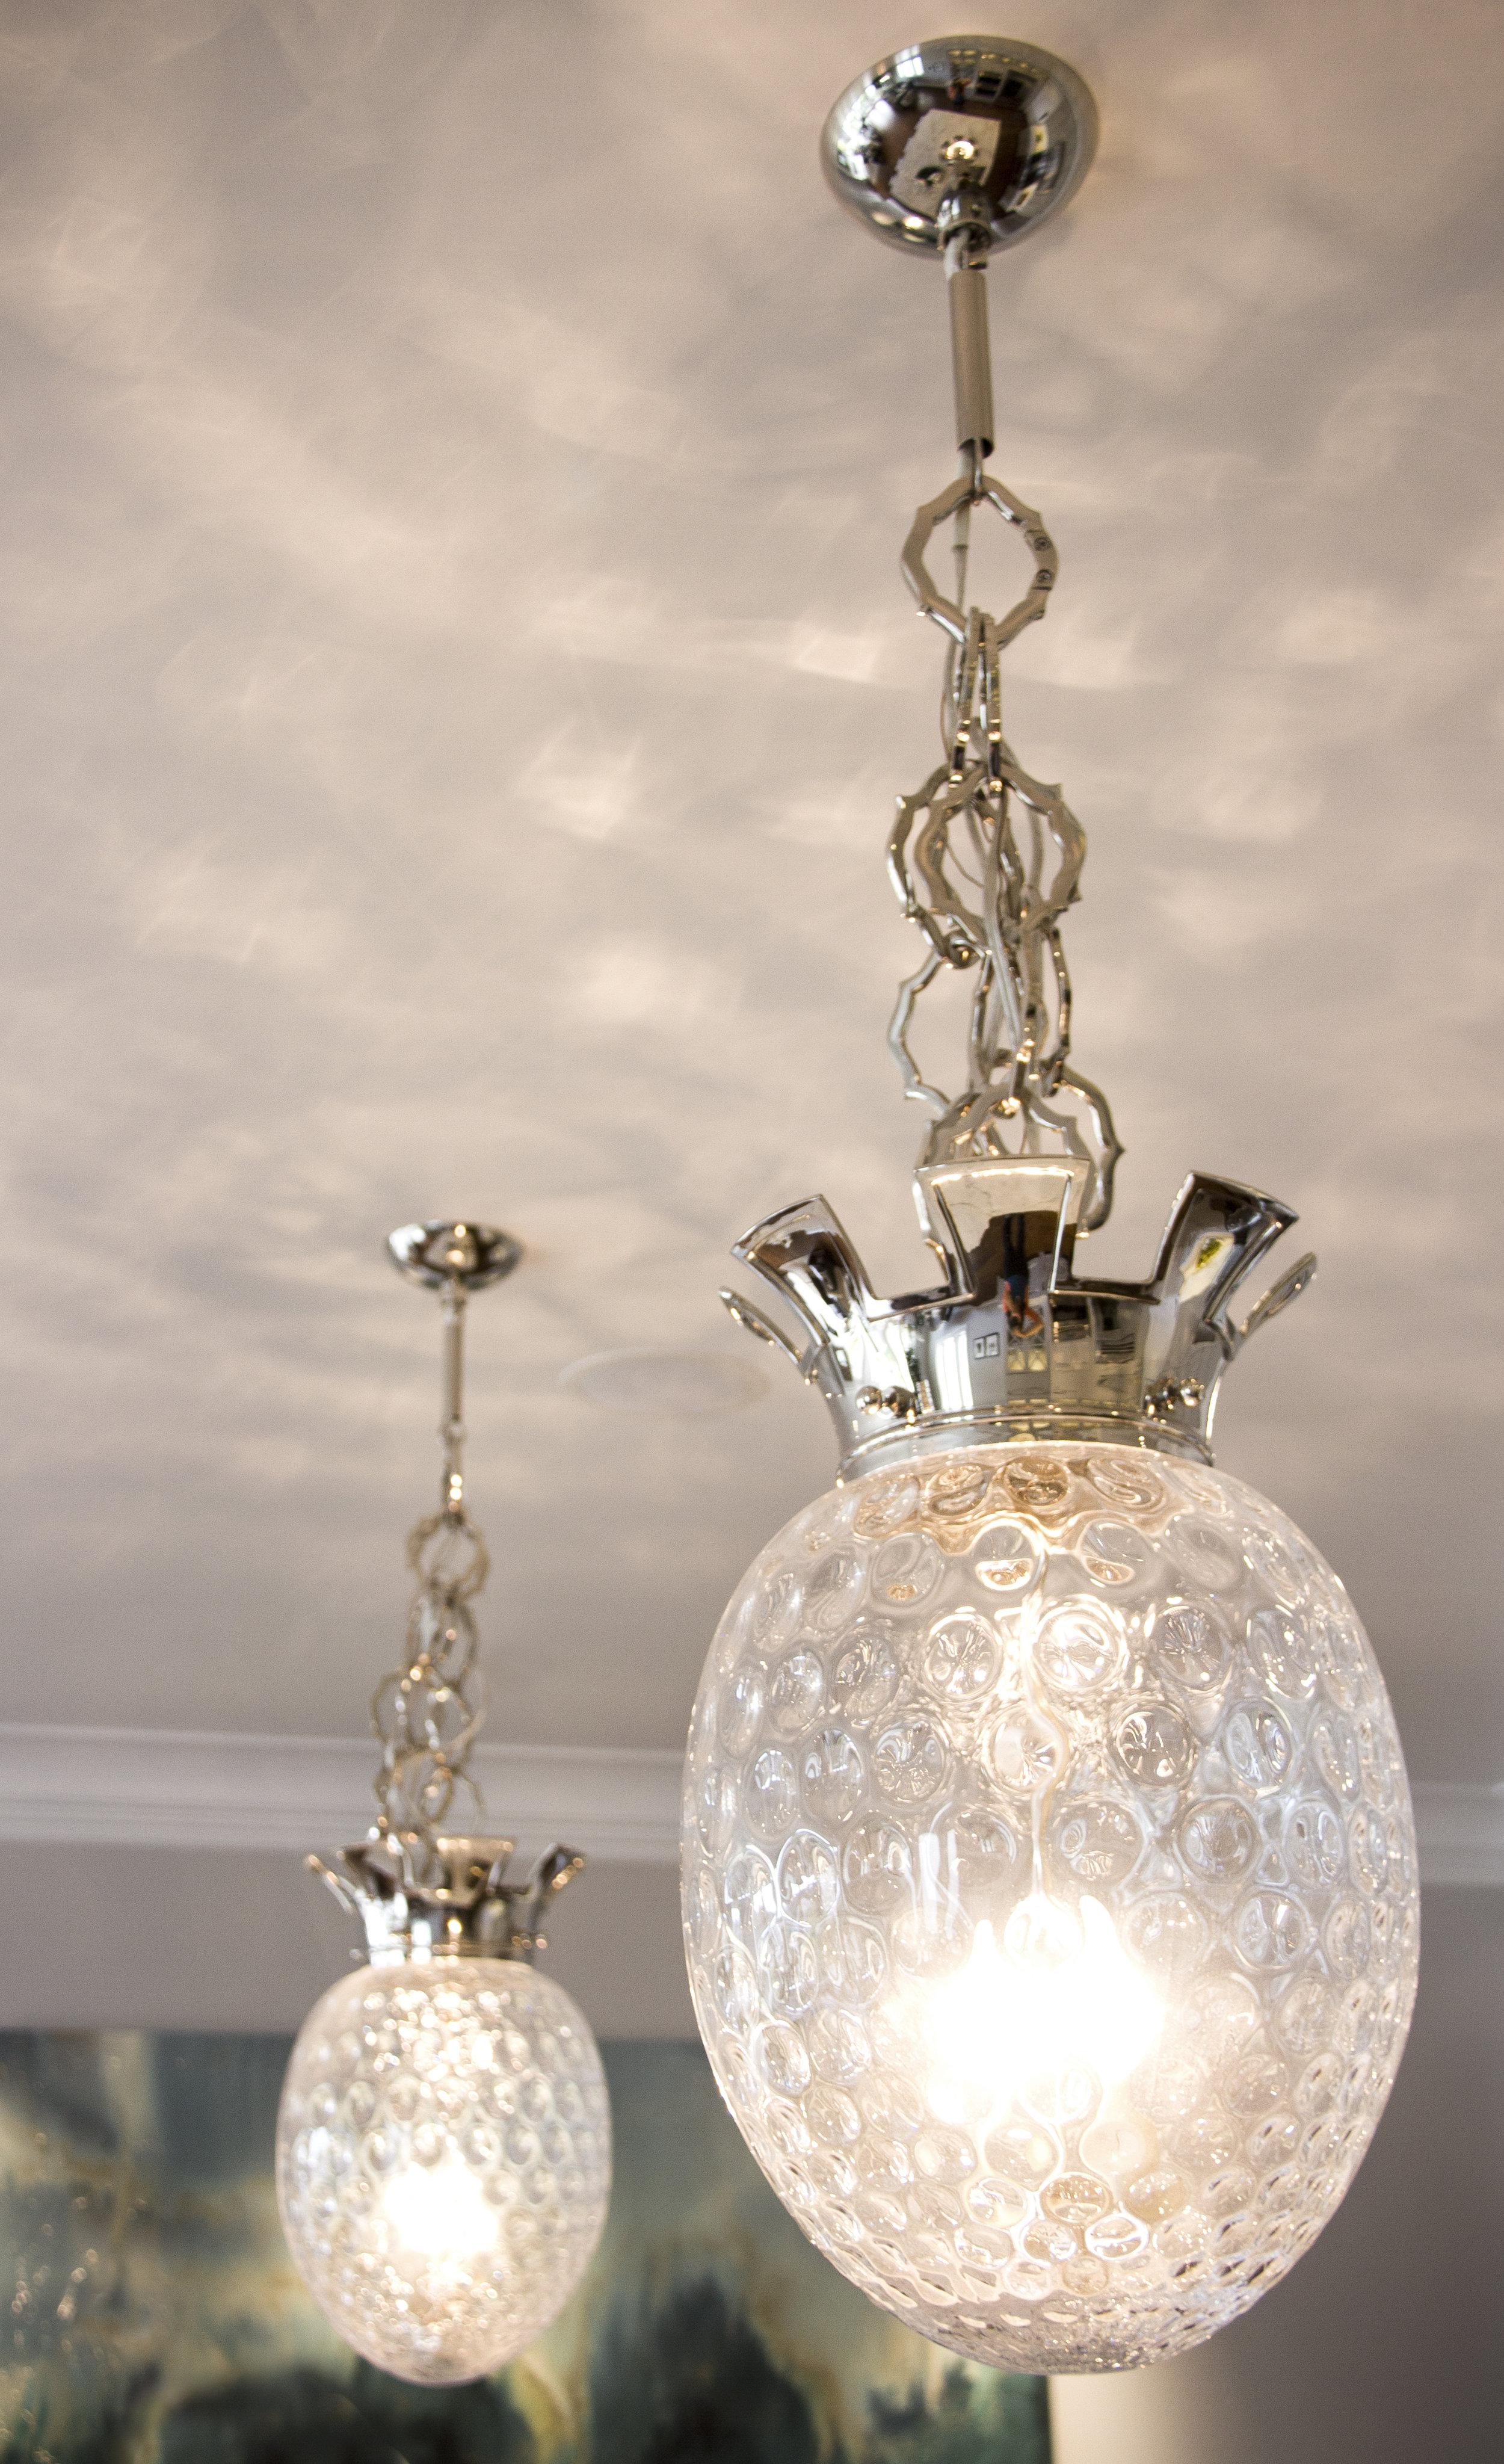 kitchen, lighting, chandelier, simple, details, glass, elegant